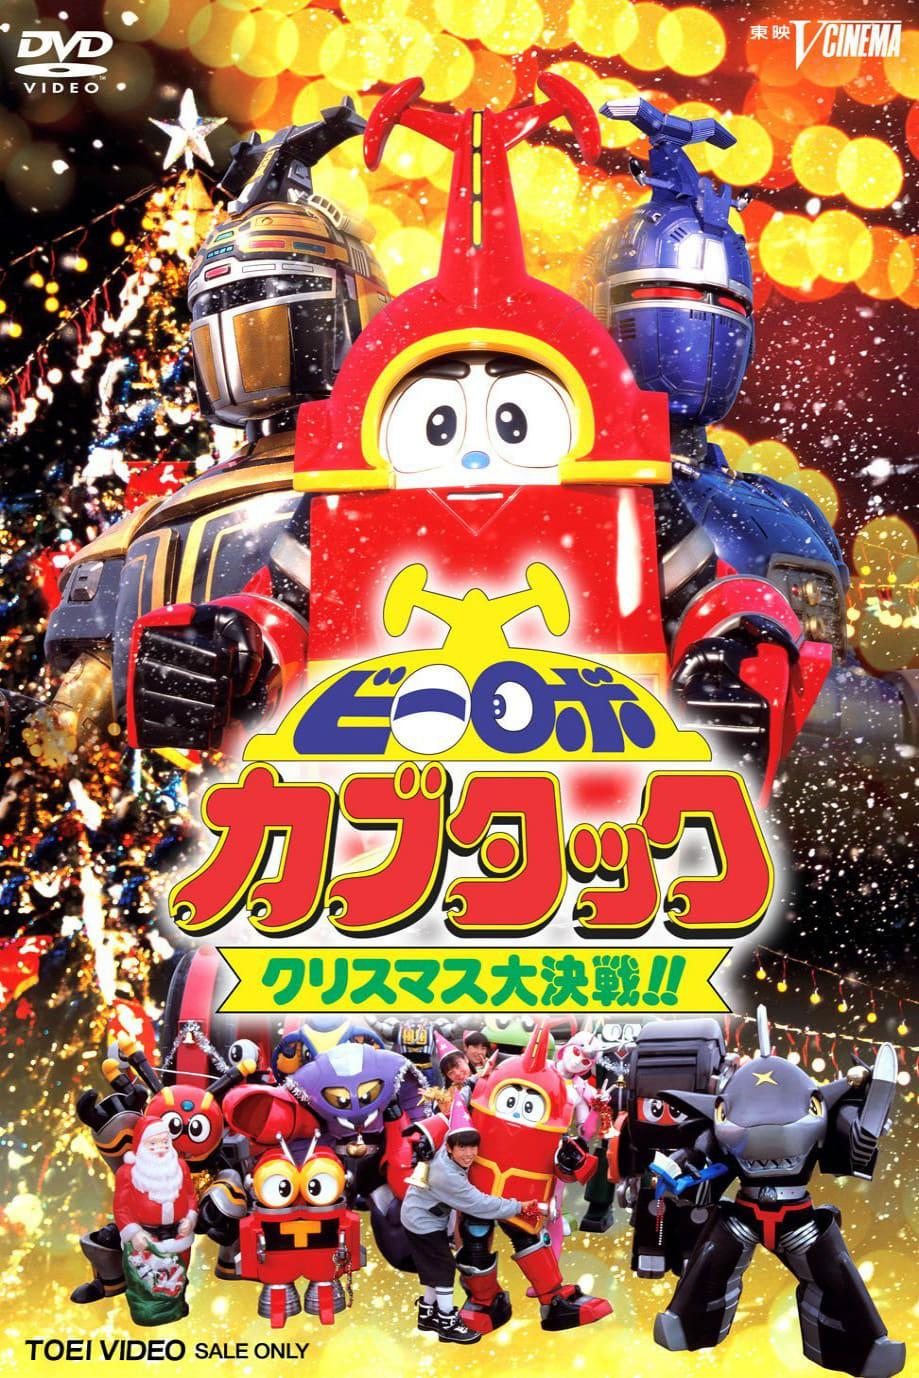 B-Robo Kabutack: The Epic Christmas Battle!!